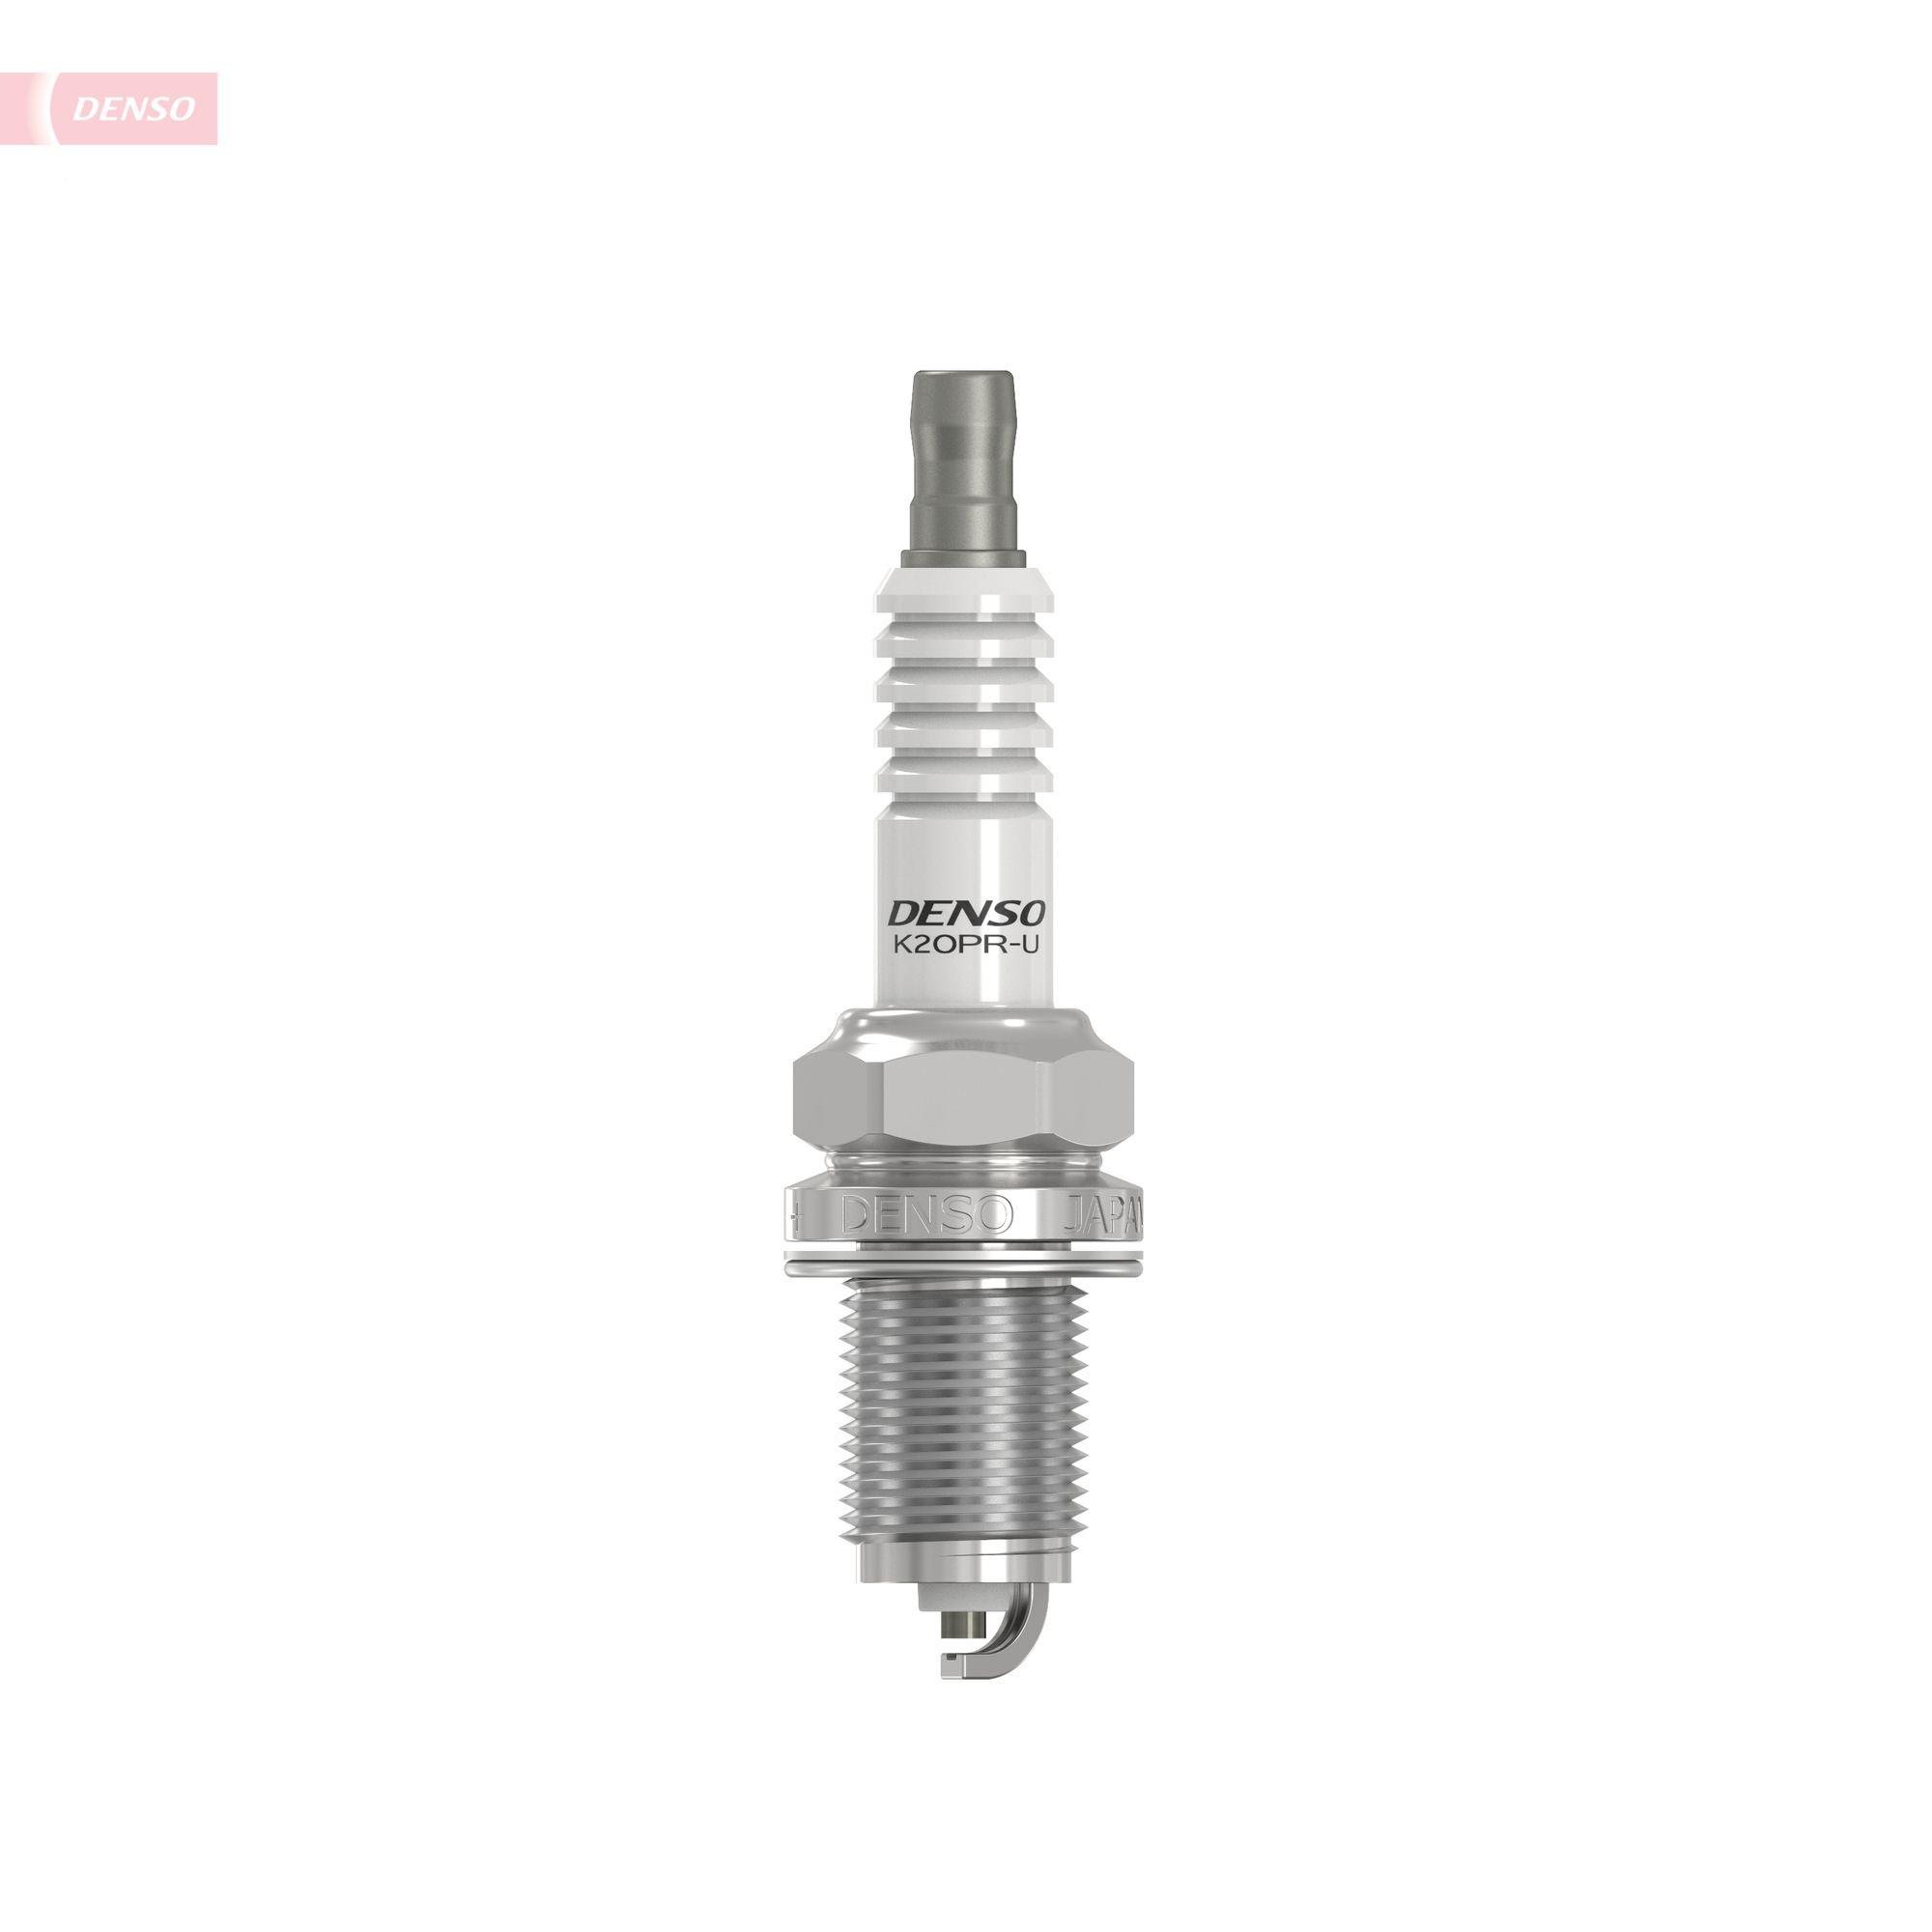 Spark Plug DENSO K20PR-U 042511031456